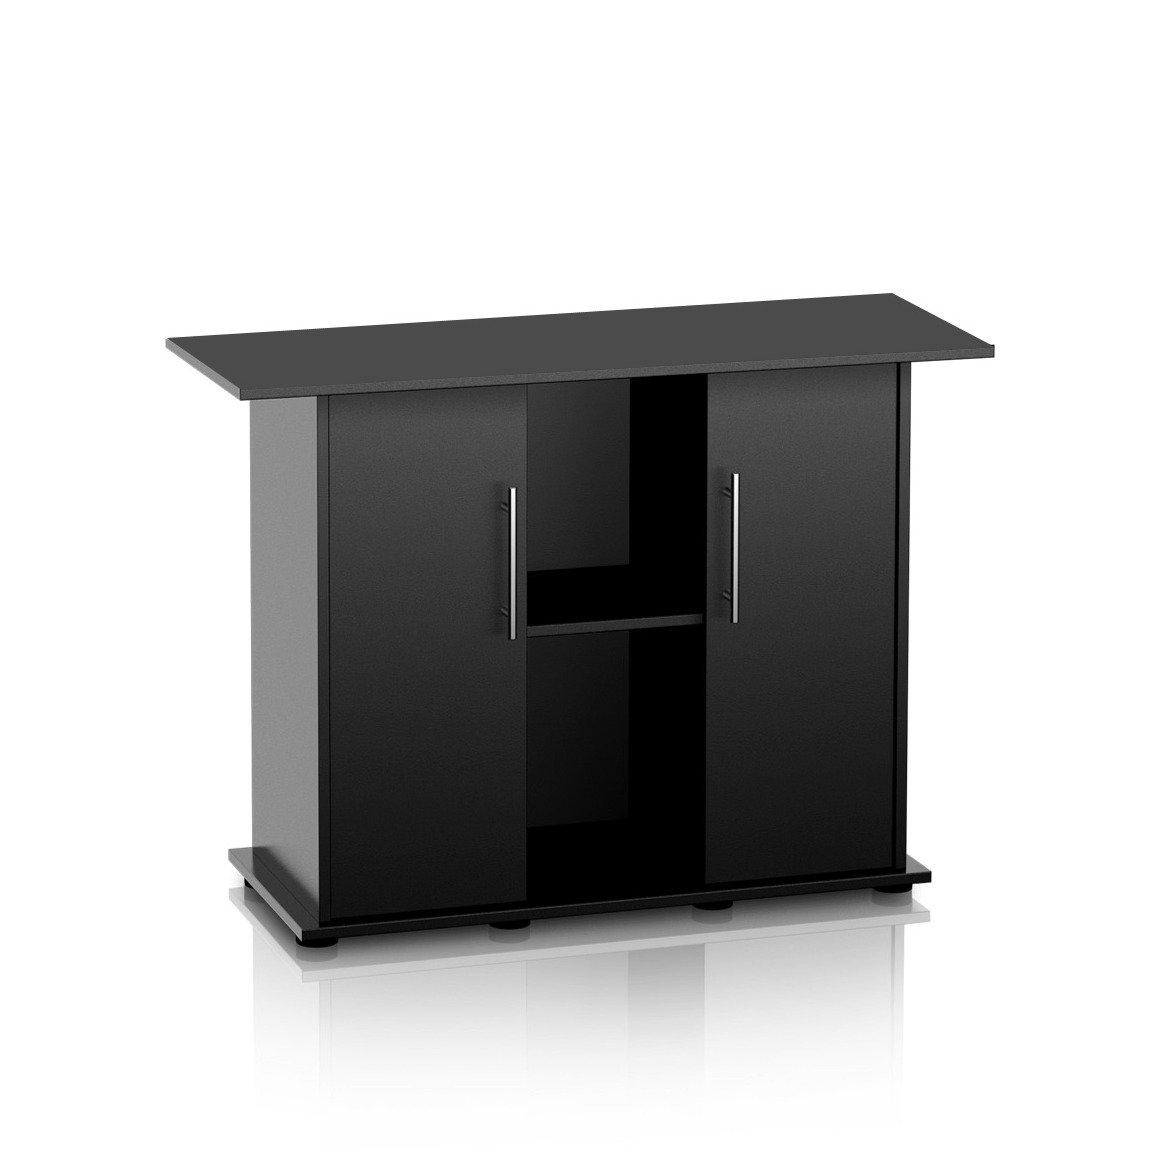 construire meuble aquarium b ton cellulaire. Black Bedroom Furniture Sets. Home Design Ideas